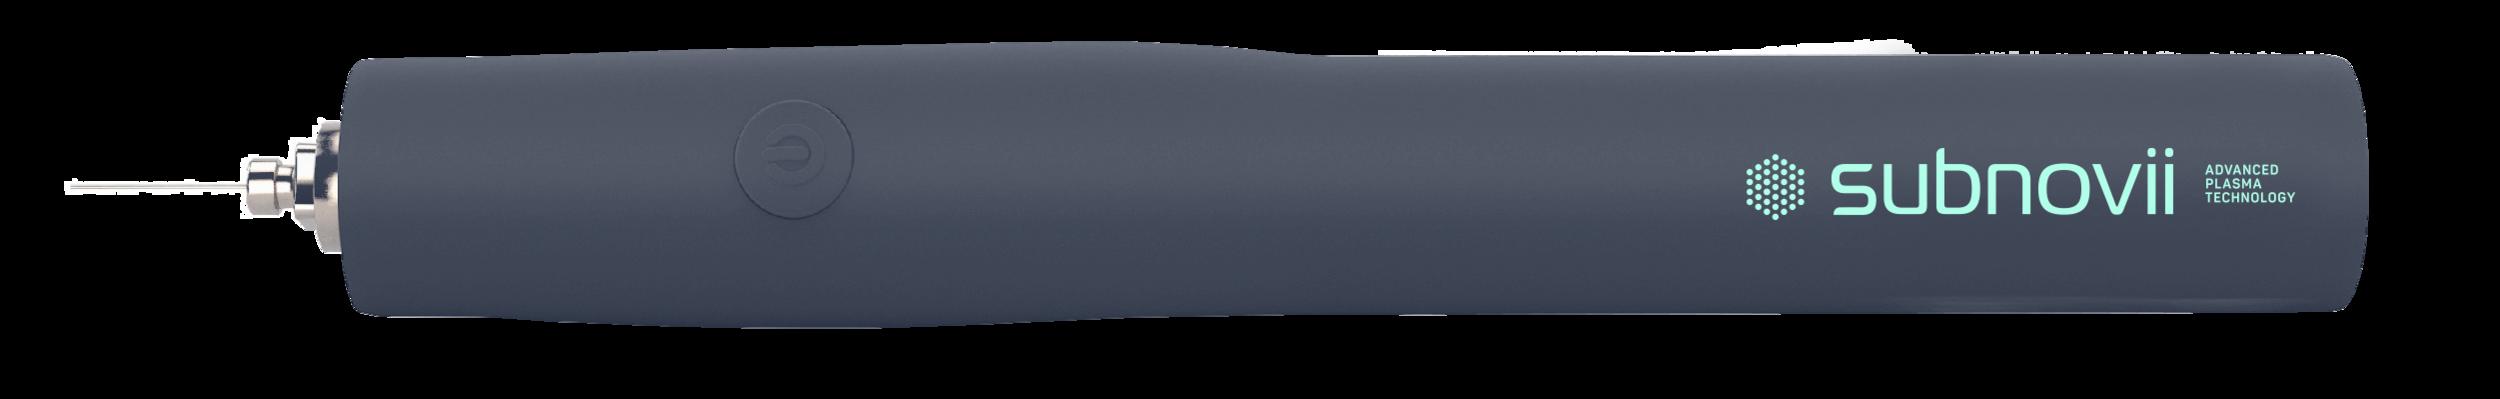 Subnovii Plasma Technology